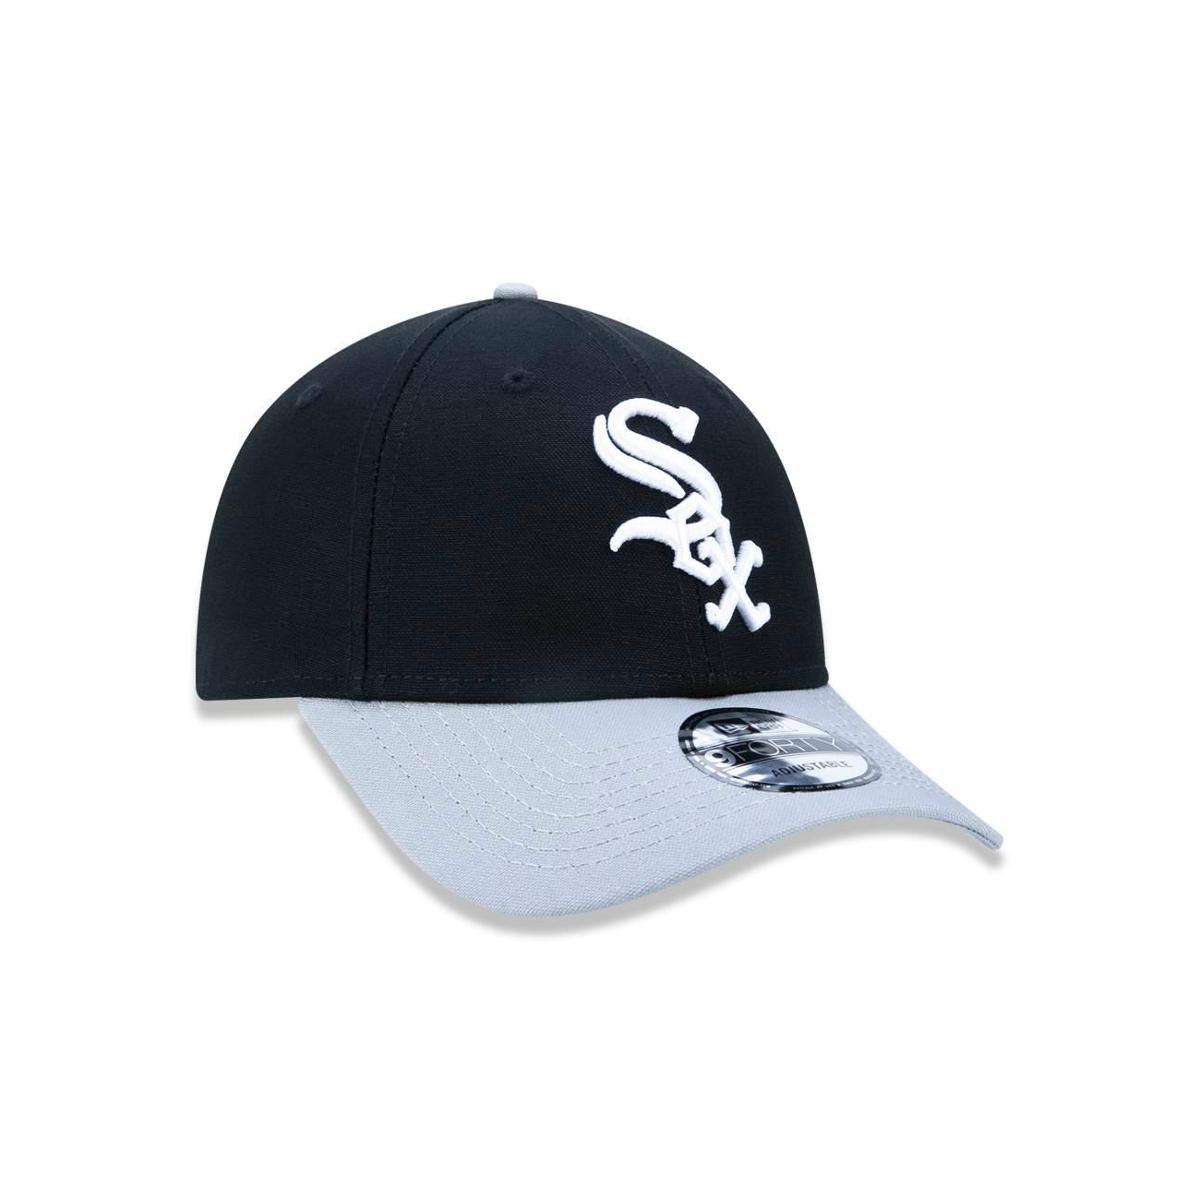 Boné 940 Chicago White Sox MLB Aba Curva Snapback New Era - Preto ... c1a48a91e9a